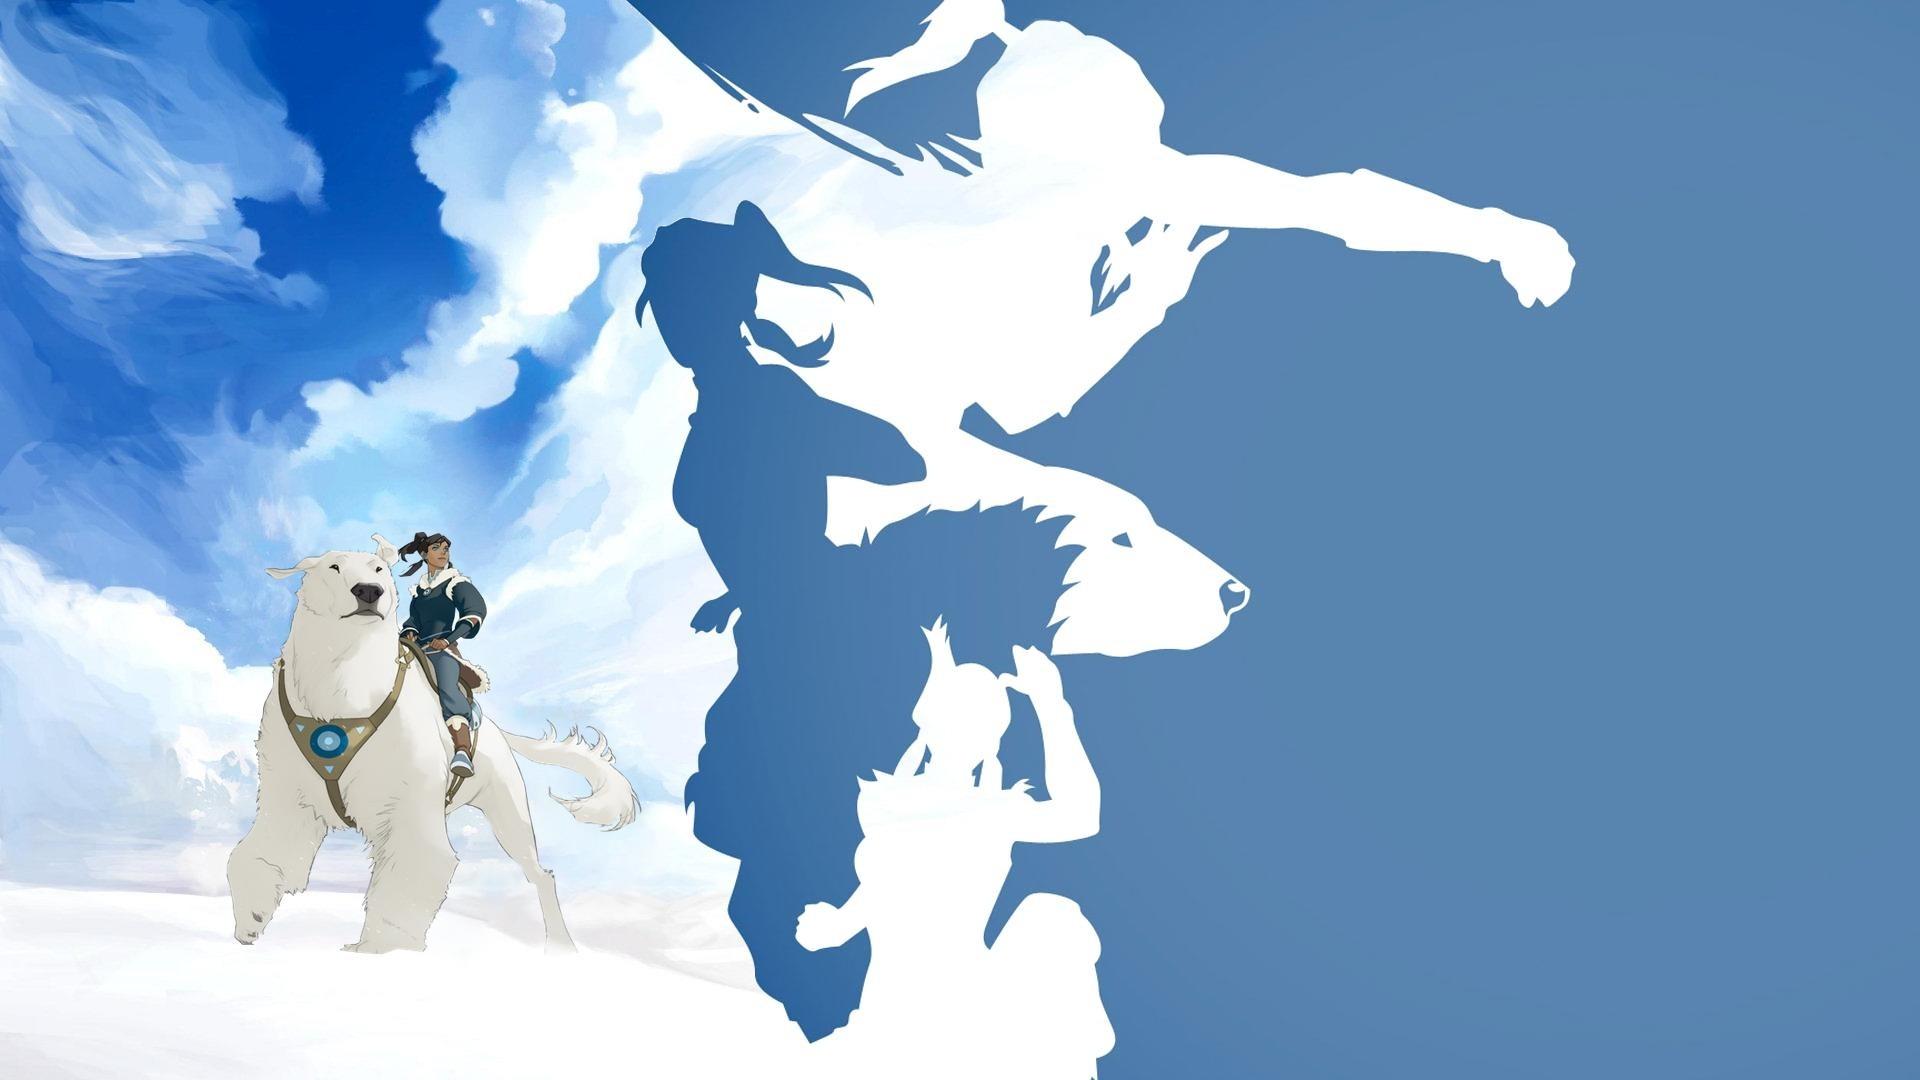 The Legend Of Korra Minimalist wallpaper for desktop